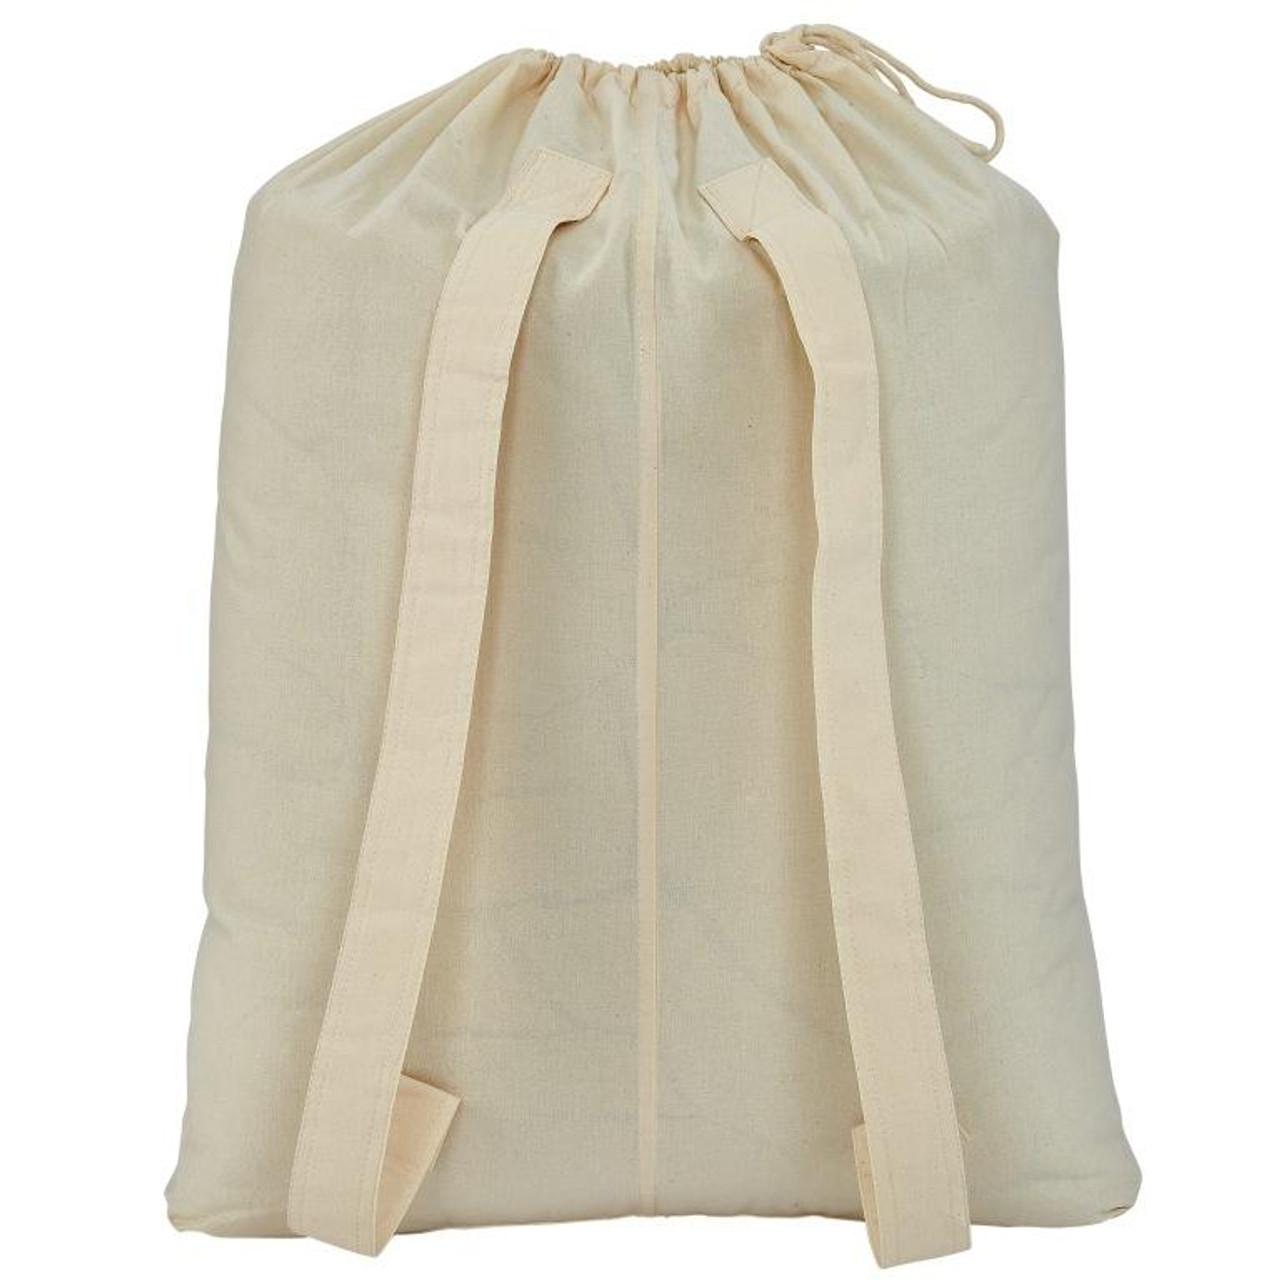 Sleep & Beyond myMerino™ Comforter, Organic Merino Wool Comforter Outer Packaging #3